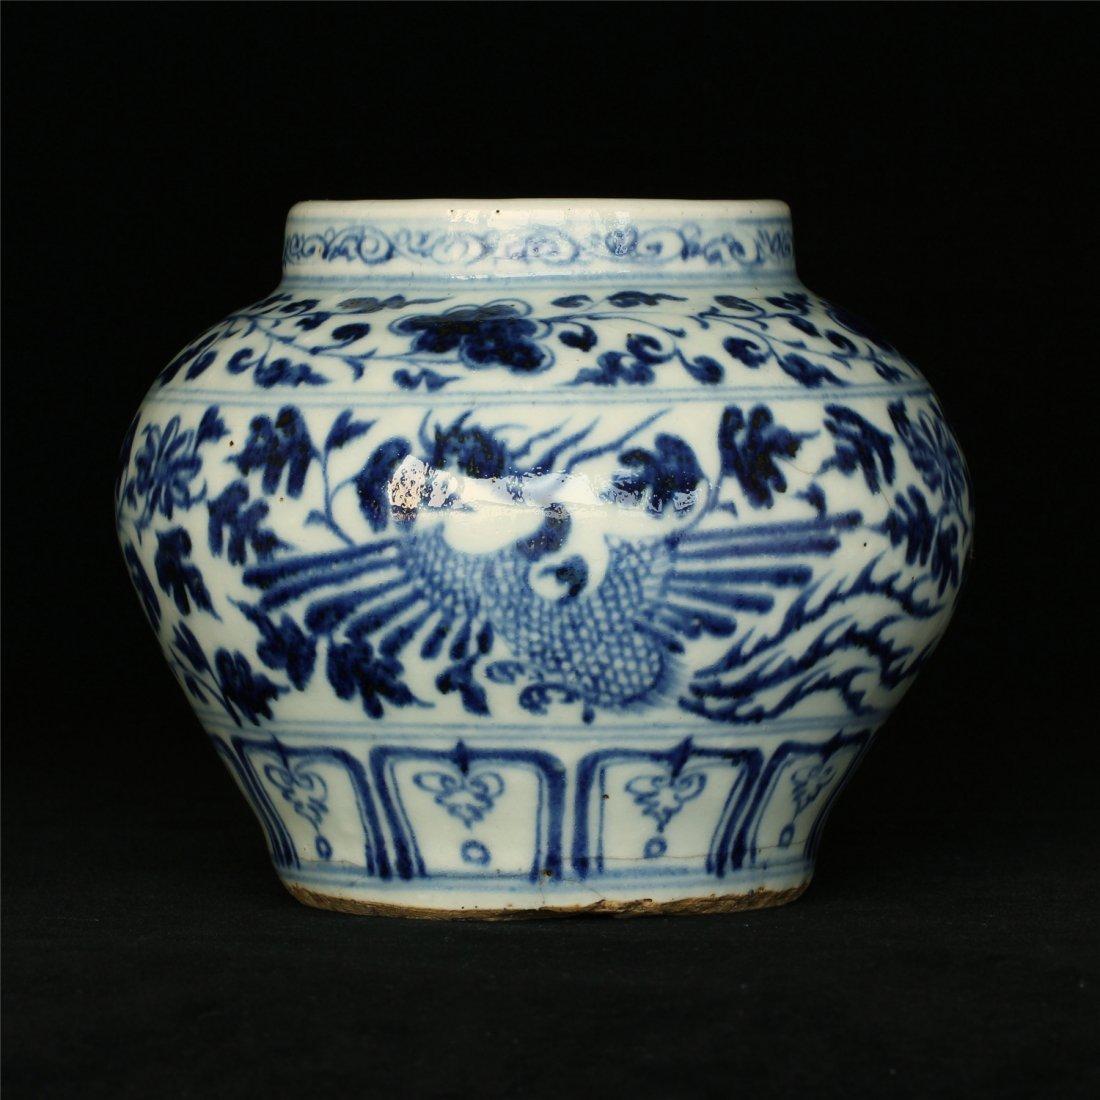 Blue and white porcelain jar.